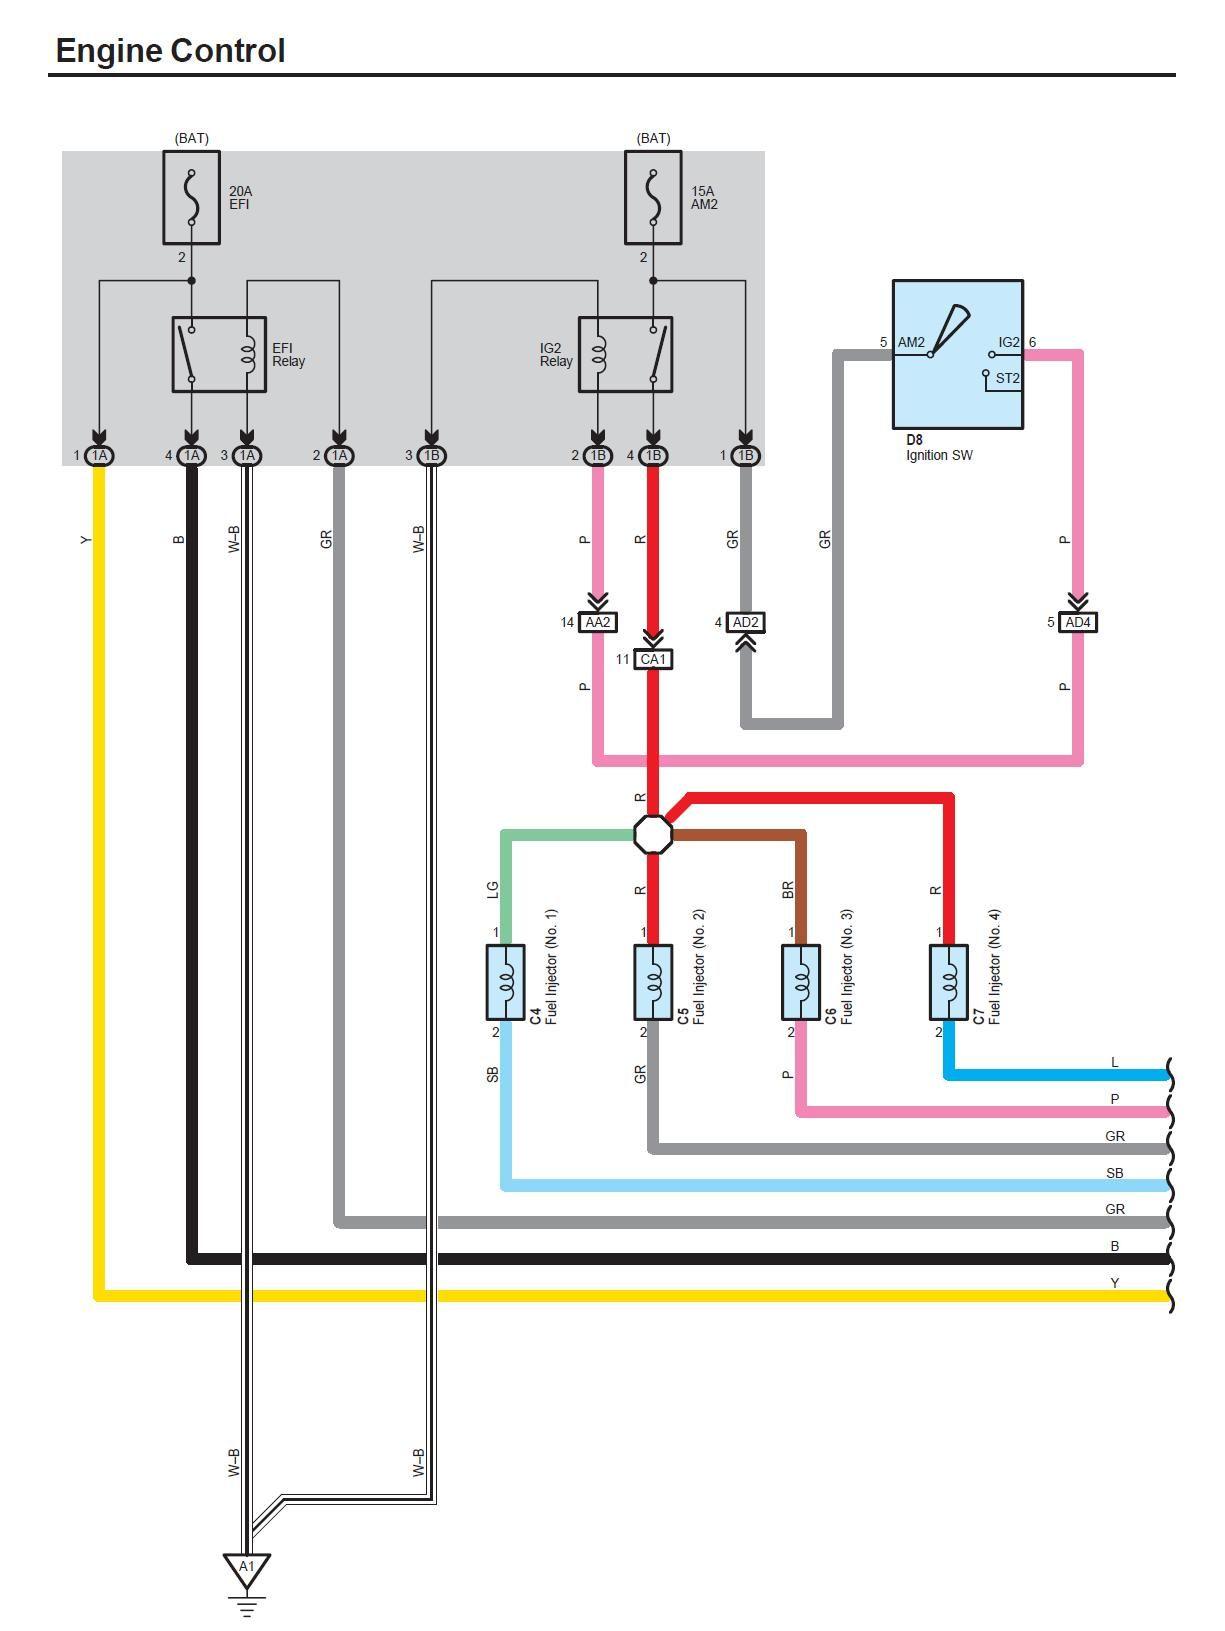 RY_1354] Toyota Yaris Engine Diagram Schematic Wiring